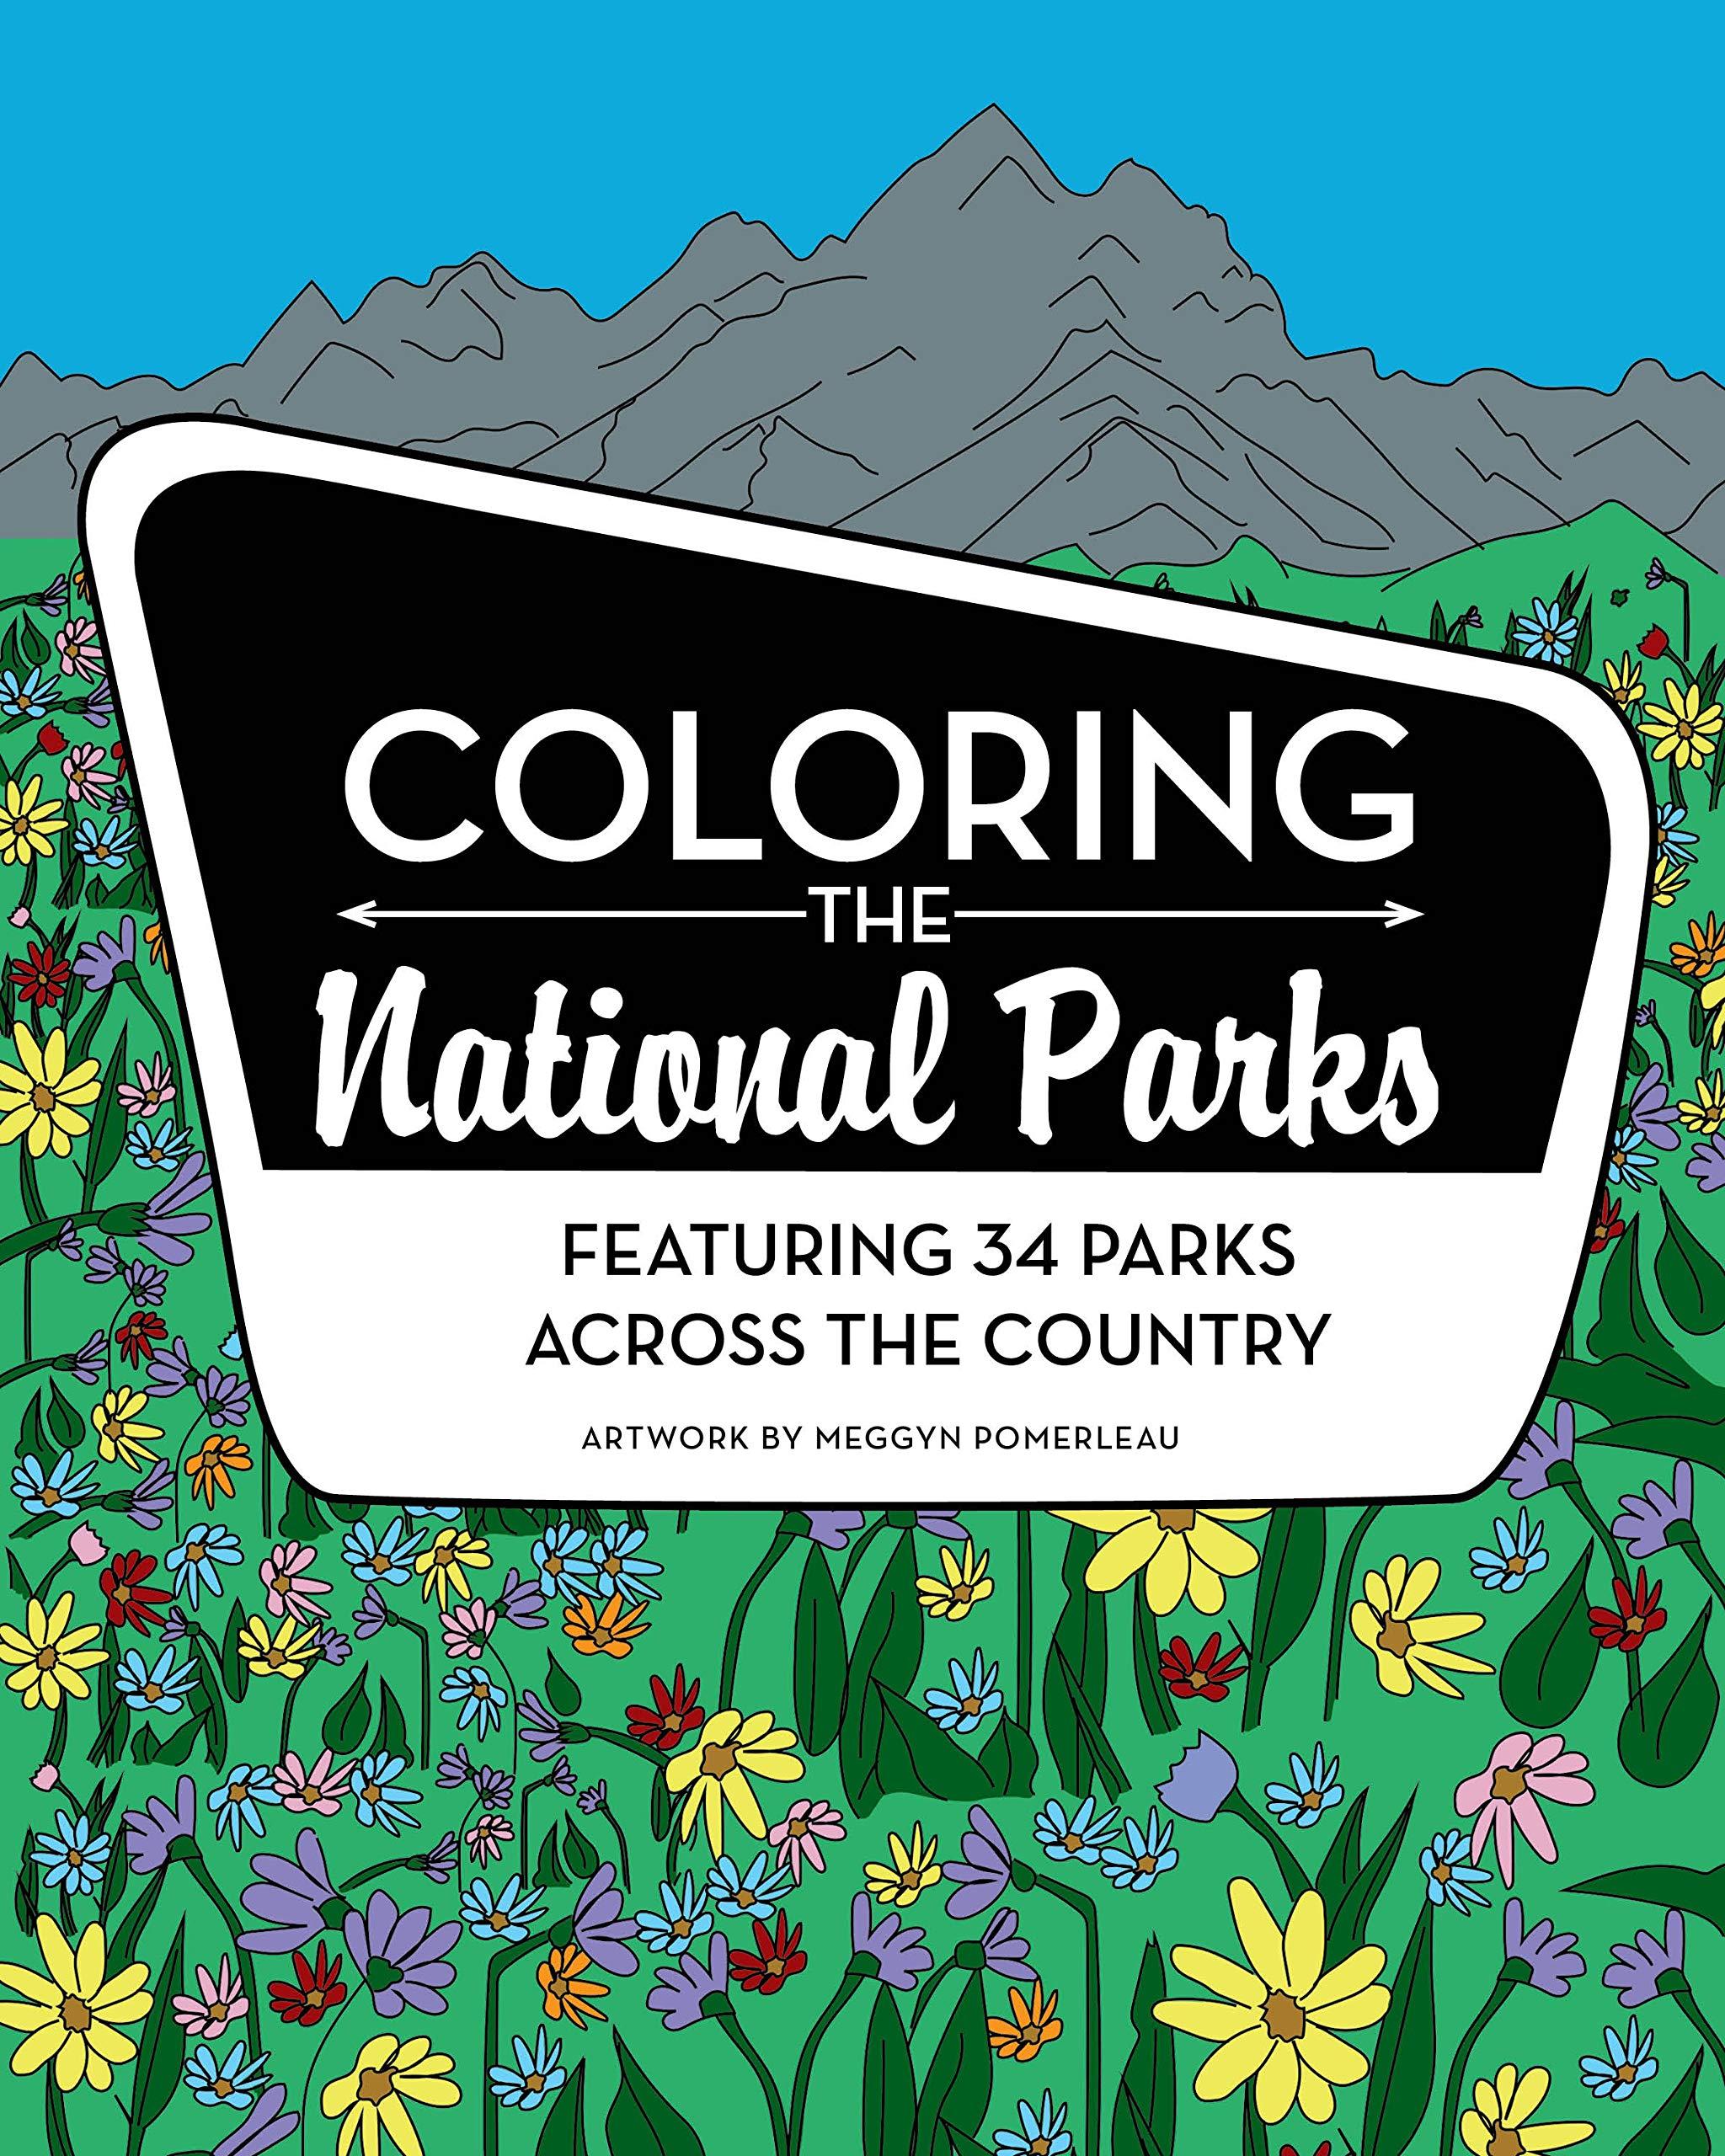 Coloring the national parks meggyn pomerleau 9781513261942 amazon